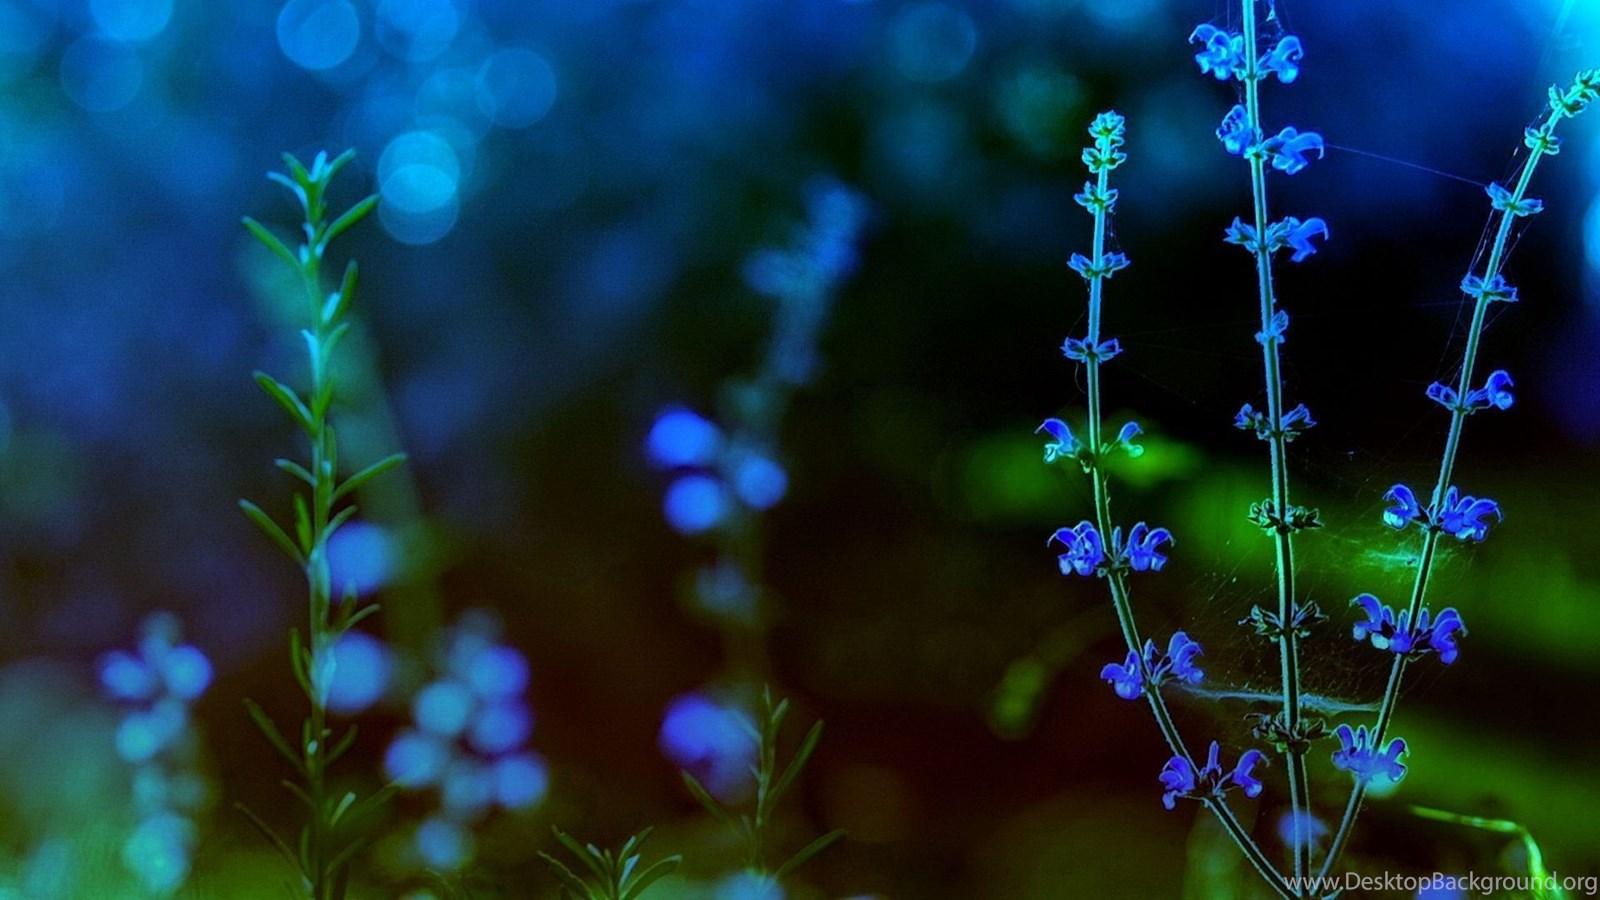 Spring Flowers Wallpapers Widescreen Desktop Background